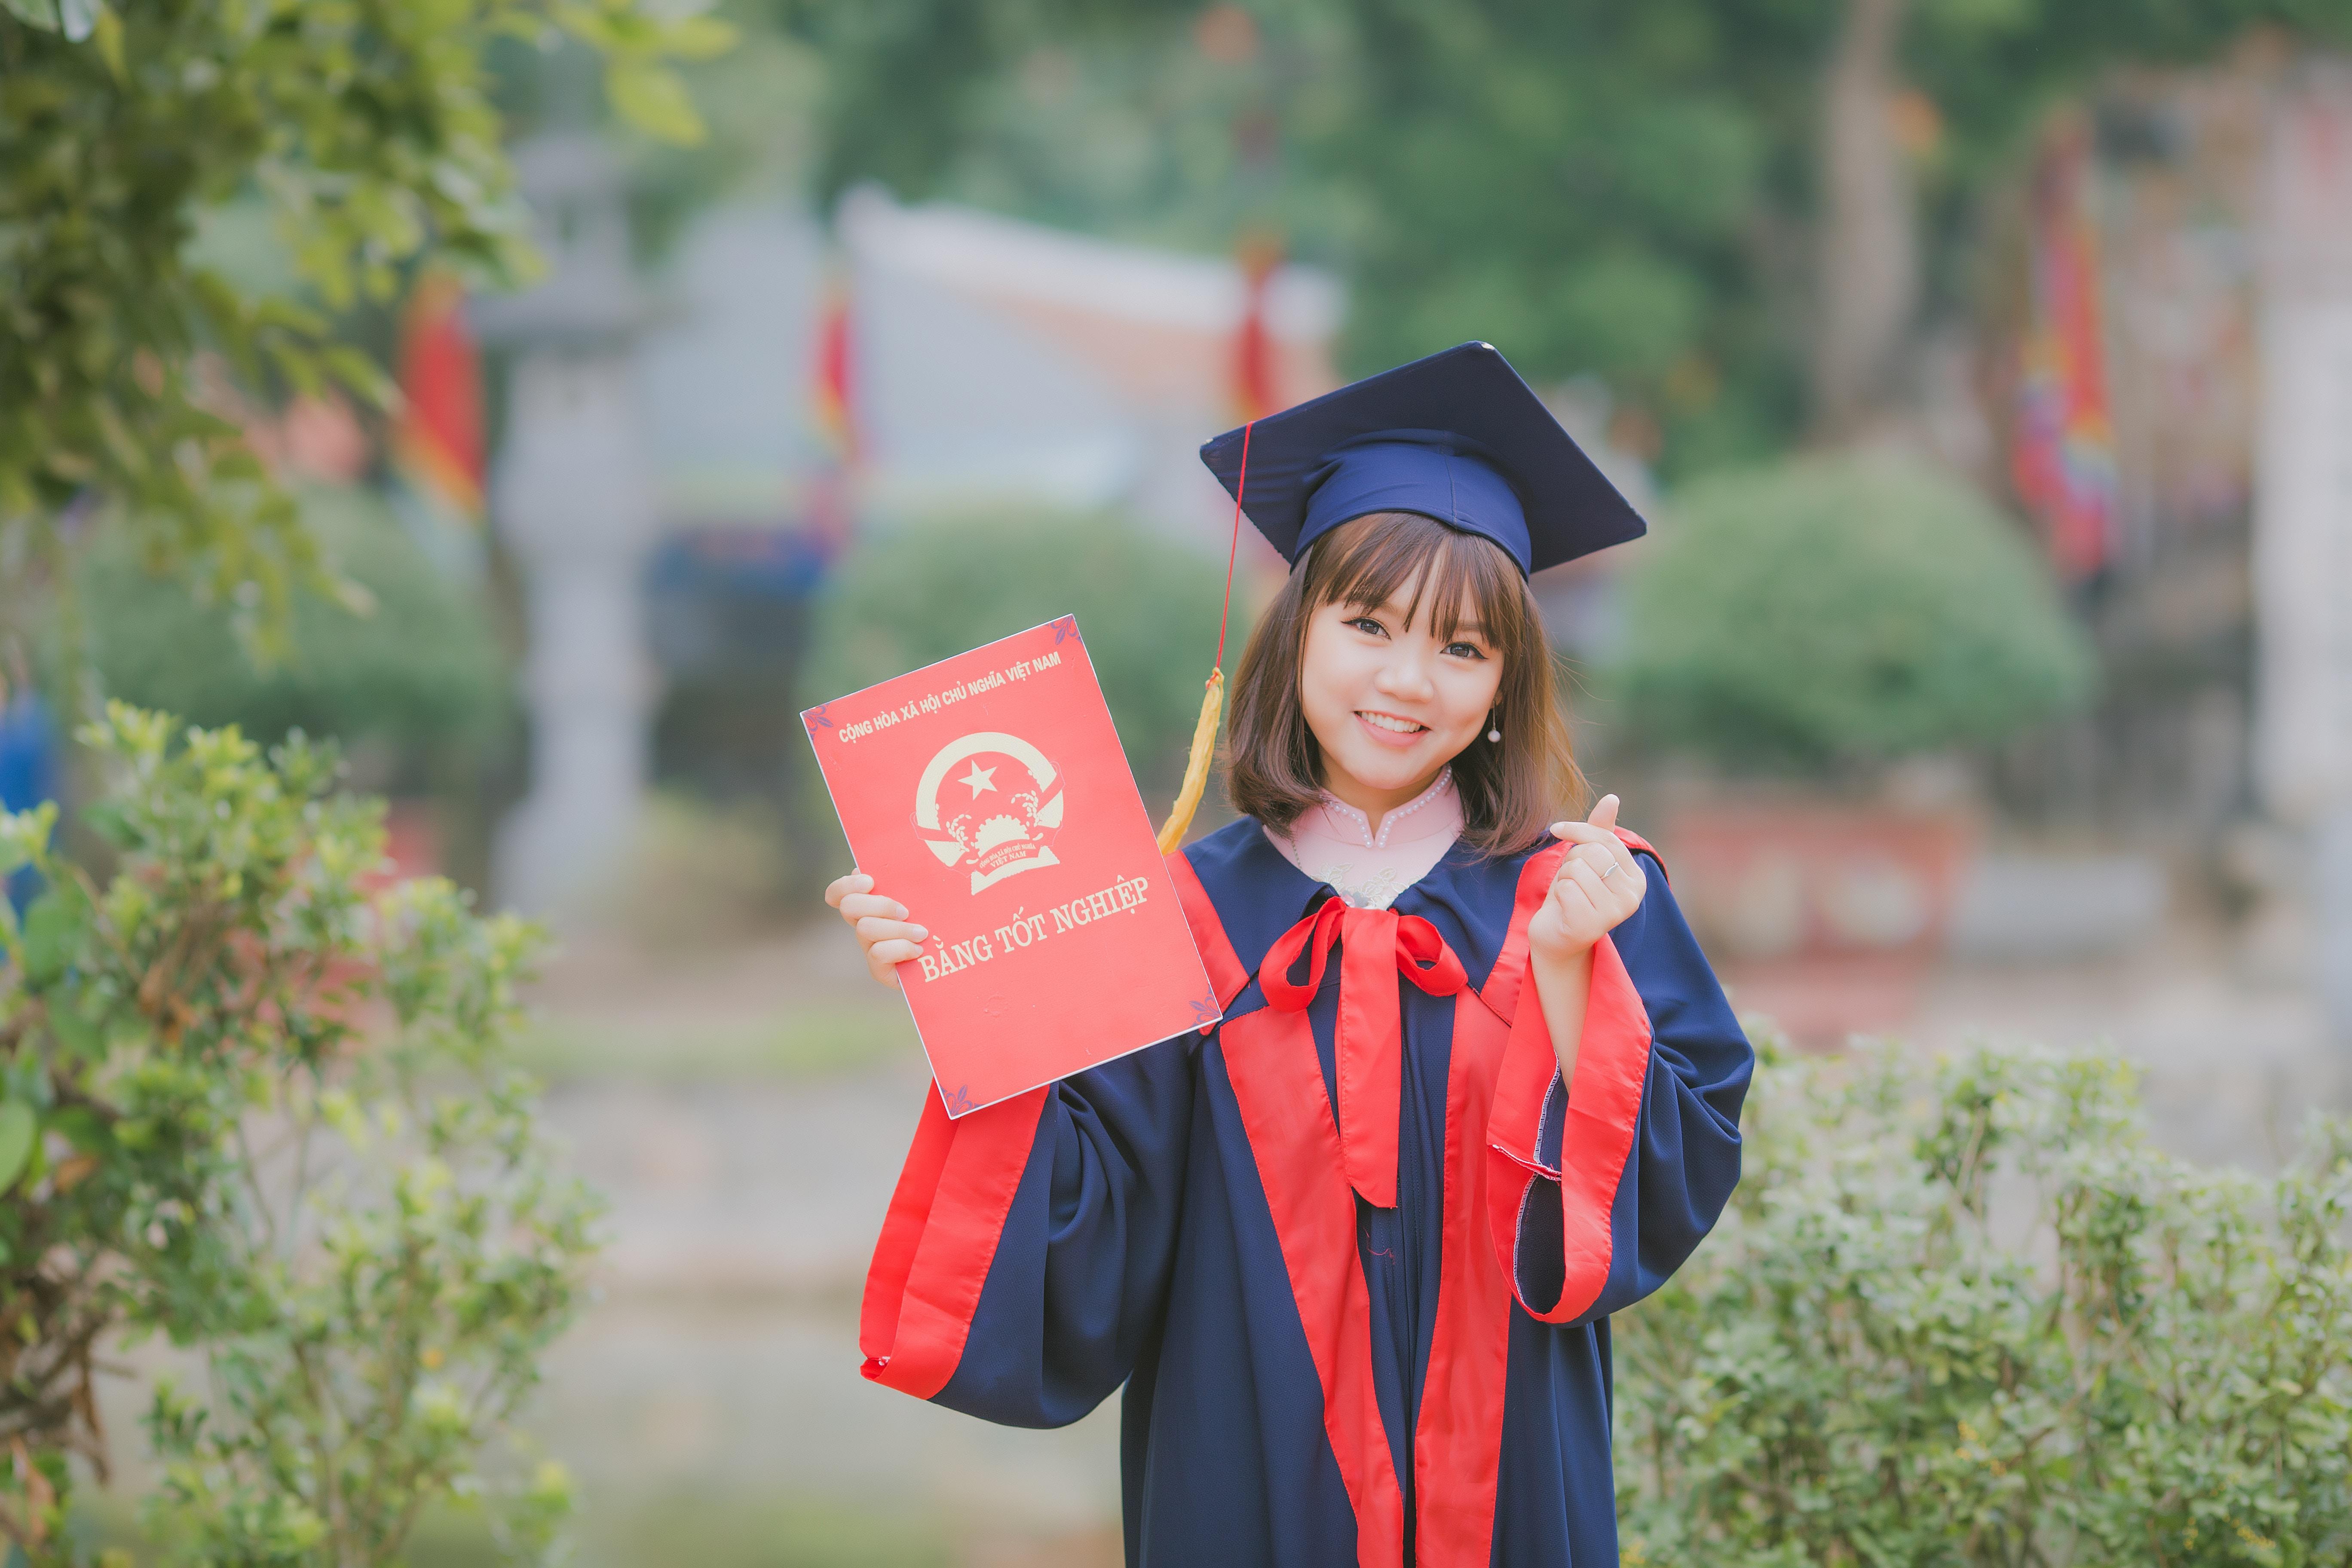 Little kid graduating